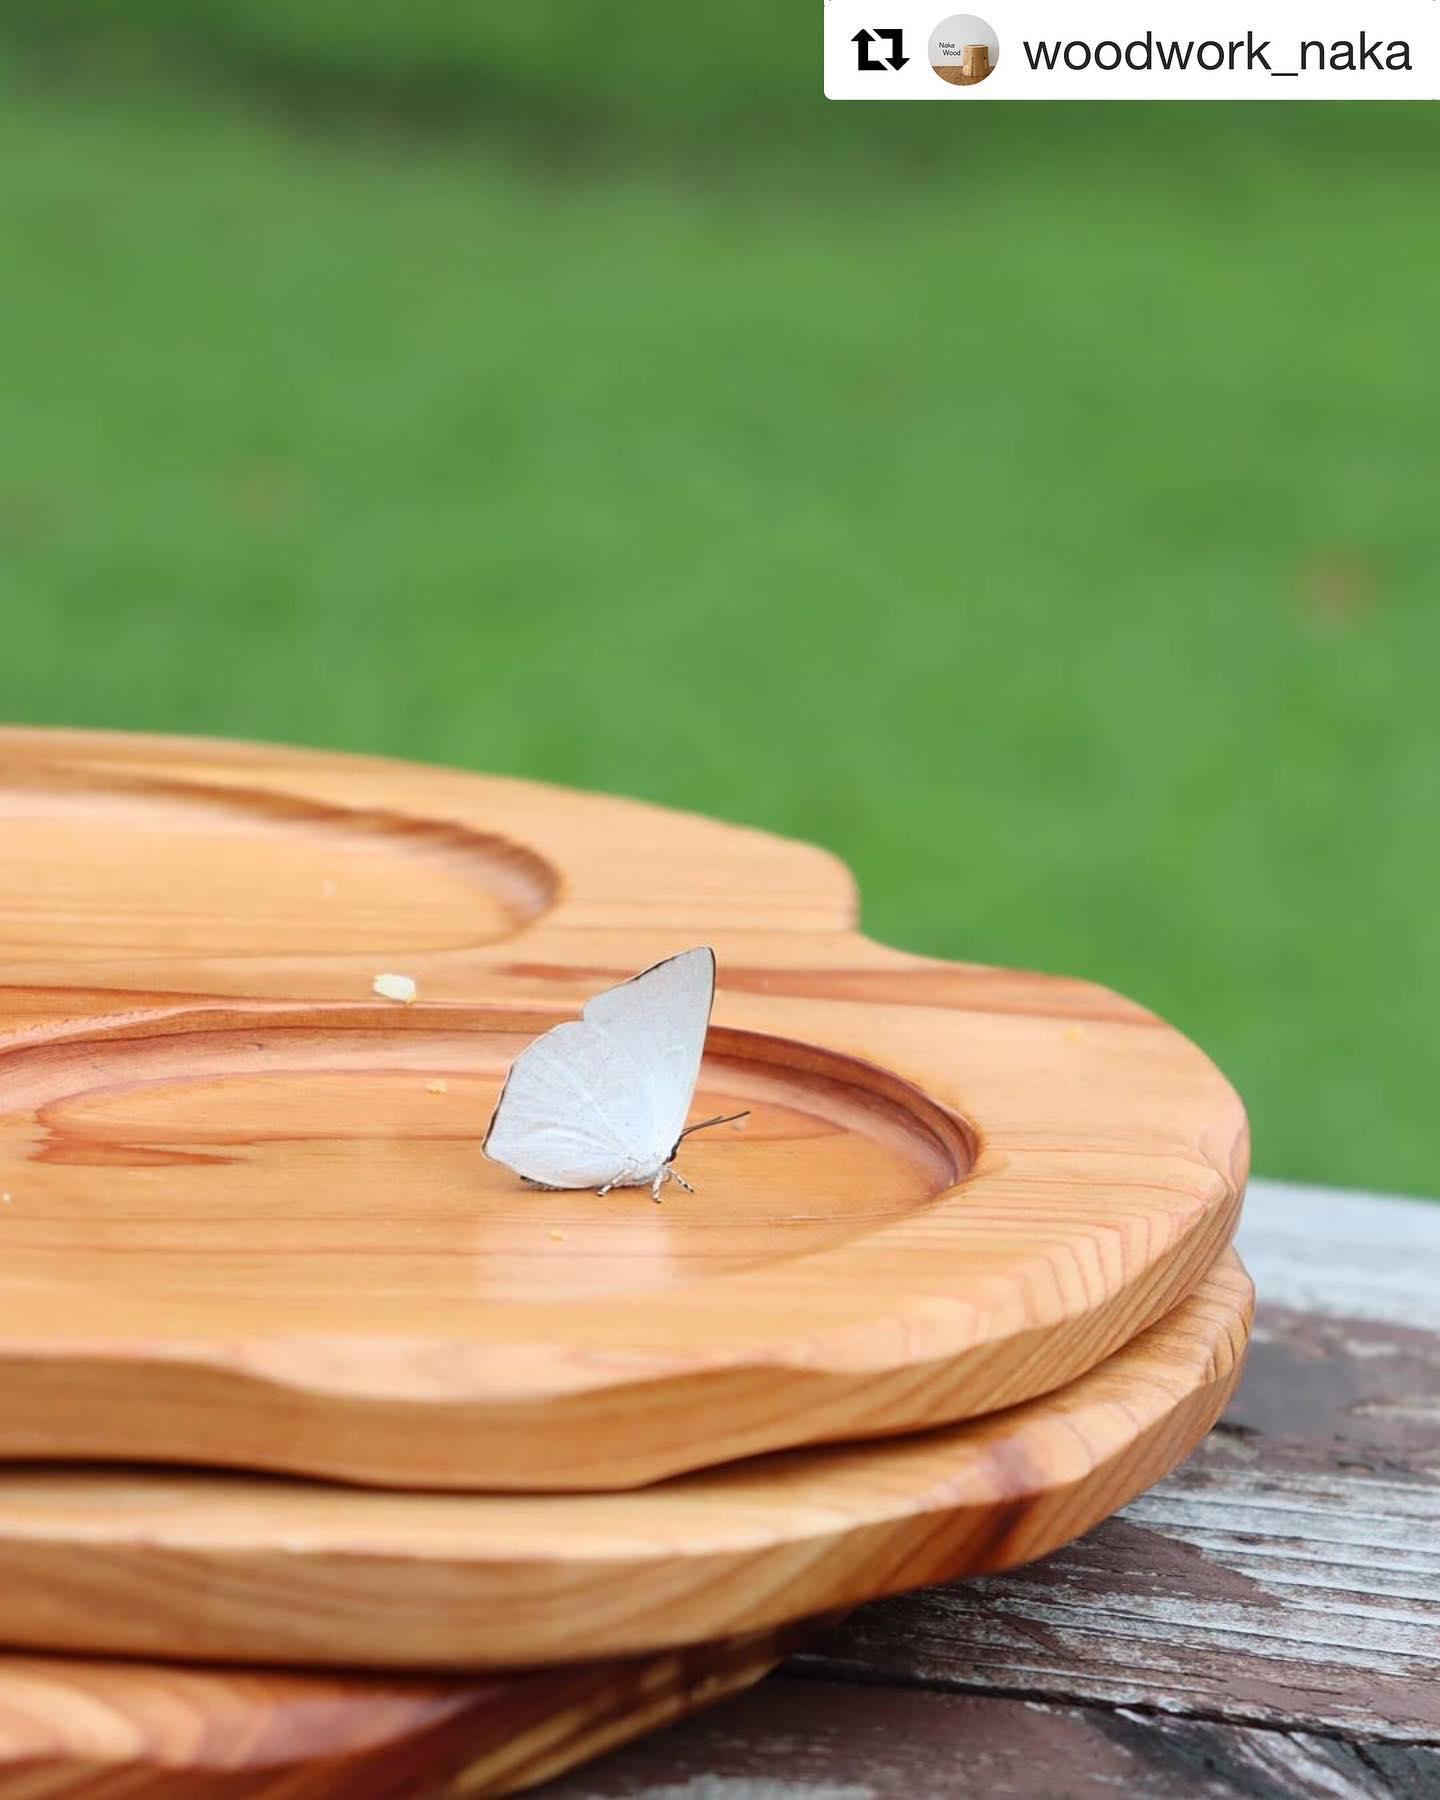 #Repost @woodwork_naka with @get_repost・・・木頭杉のプレート🦋#wood #woodplate #kukuplate #woodwork #nakawood #woodboardkuku #cooljapan